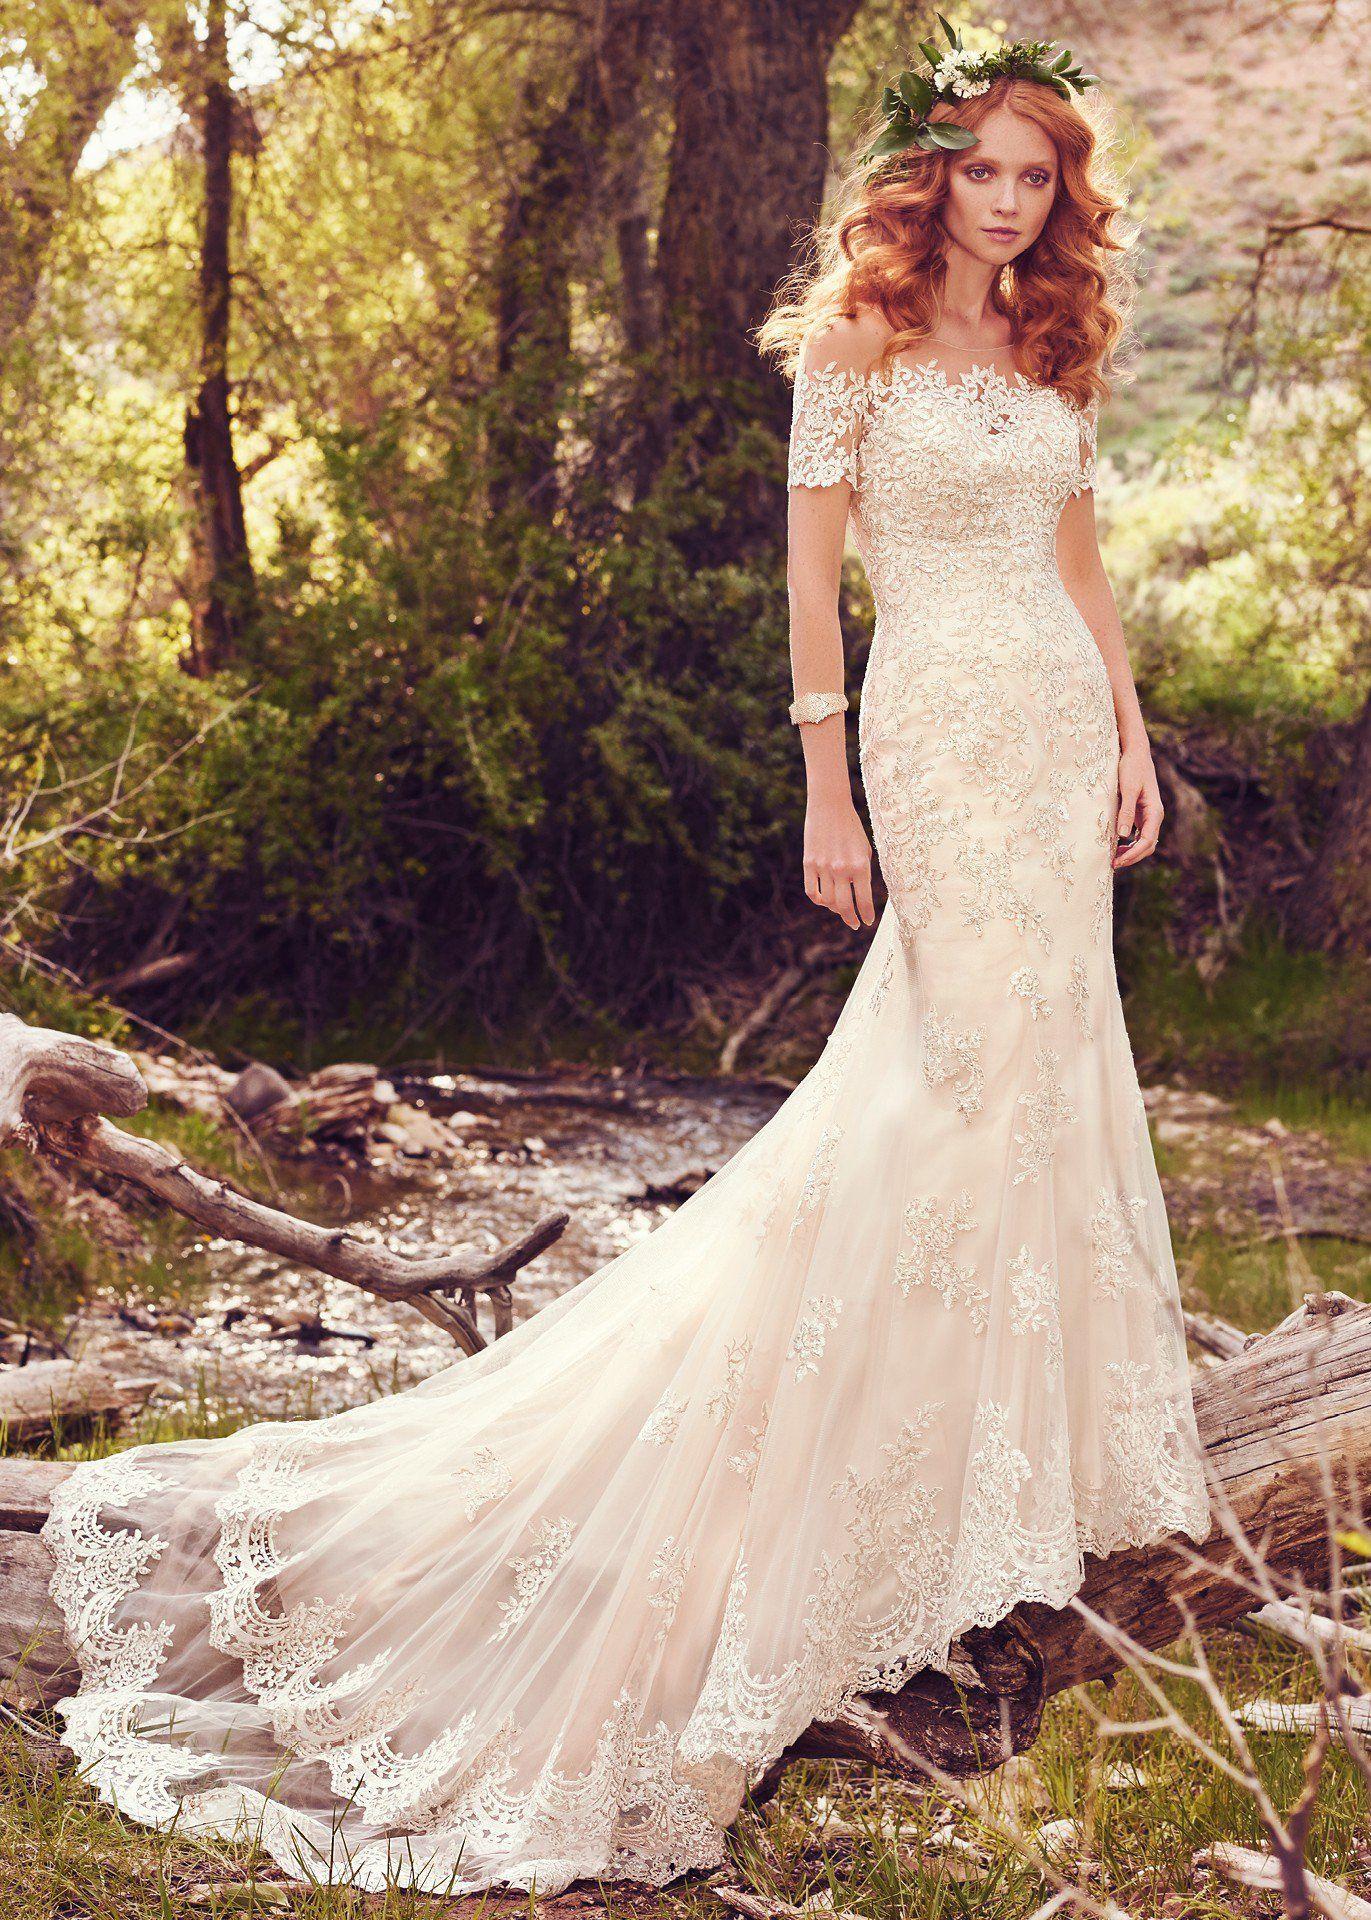 #MaggieSottero – Product Categories – New Beginnings Bridal Studio #bridalgowns #weddingdresses